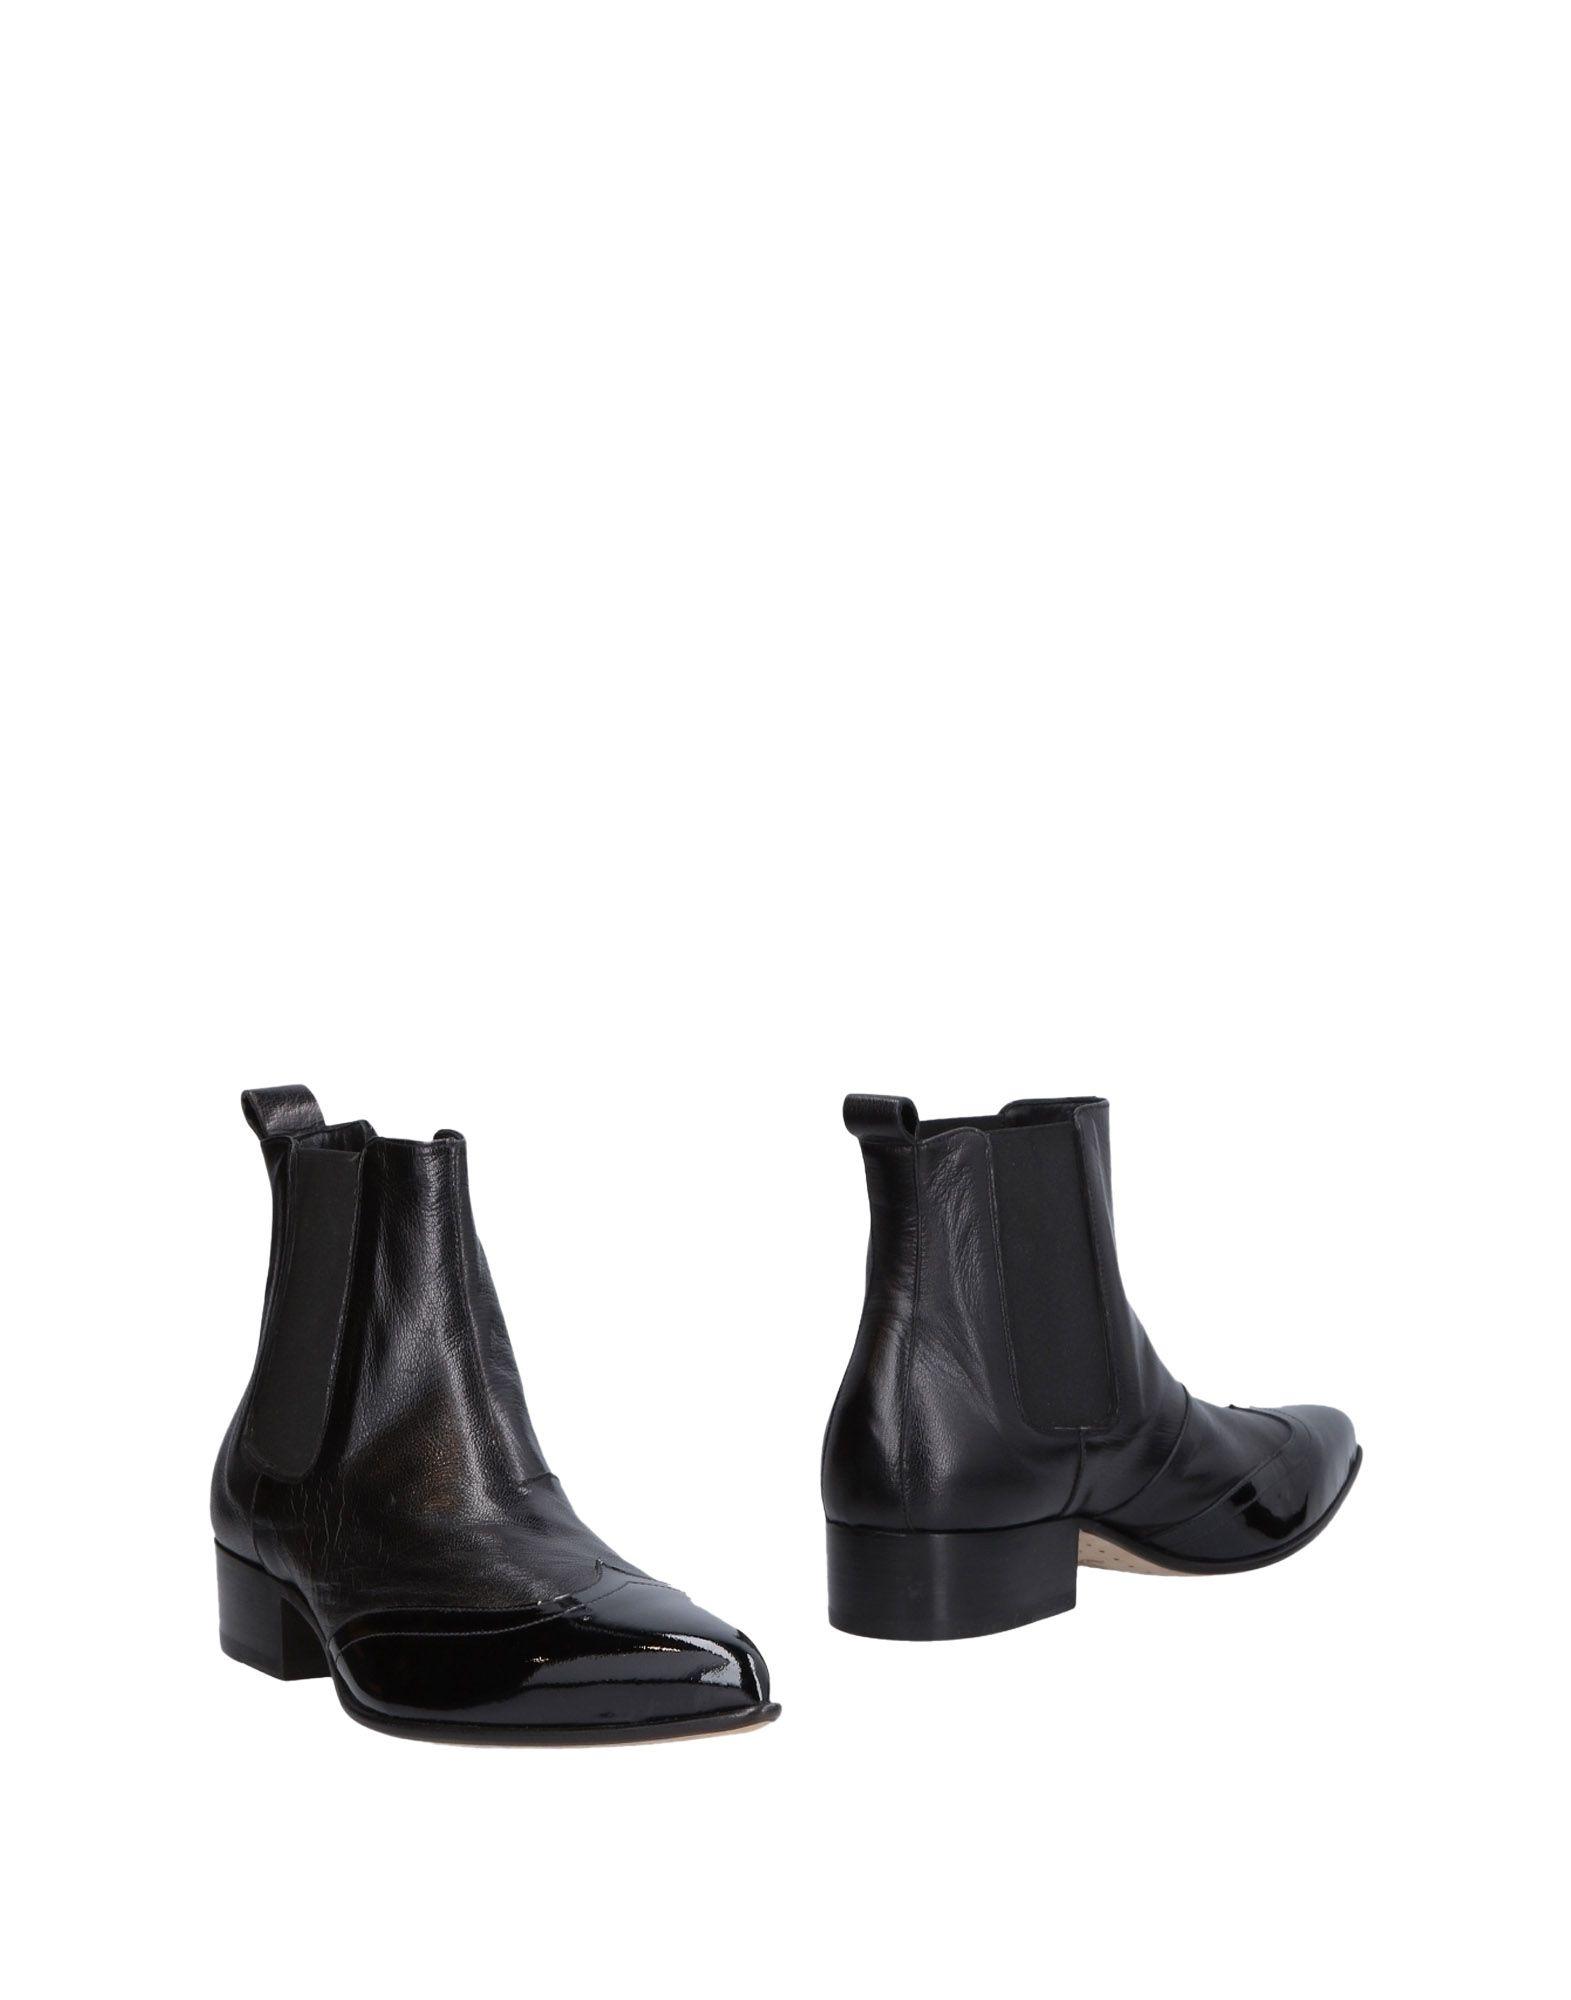 John Galliano Boots - Men John Galliano Boots - online on  Canada - Boots 11456120TU cbf156